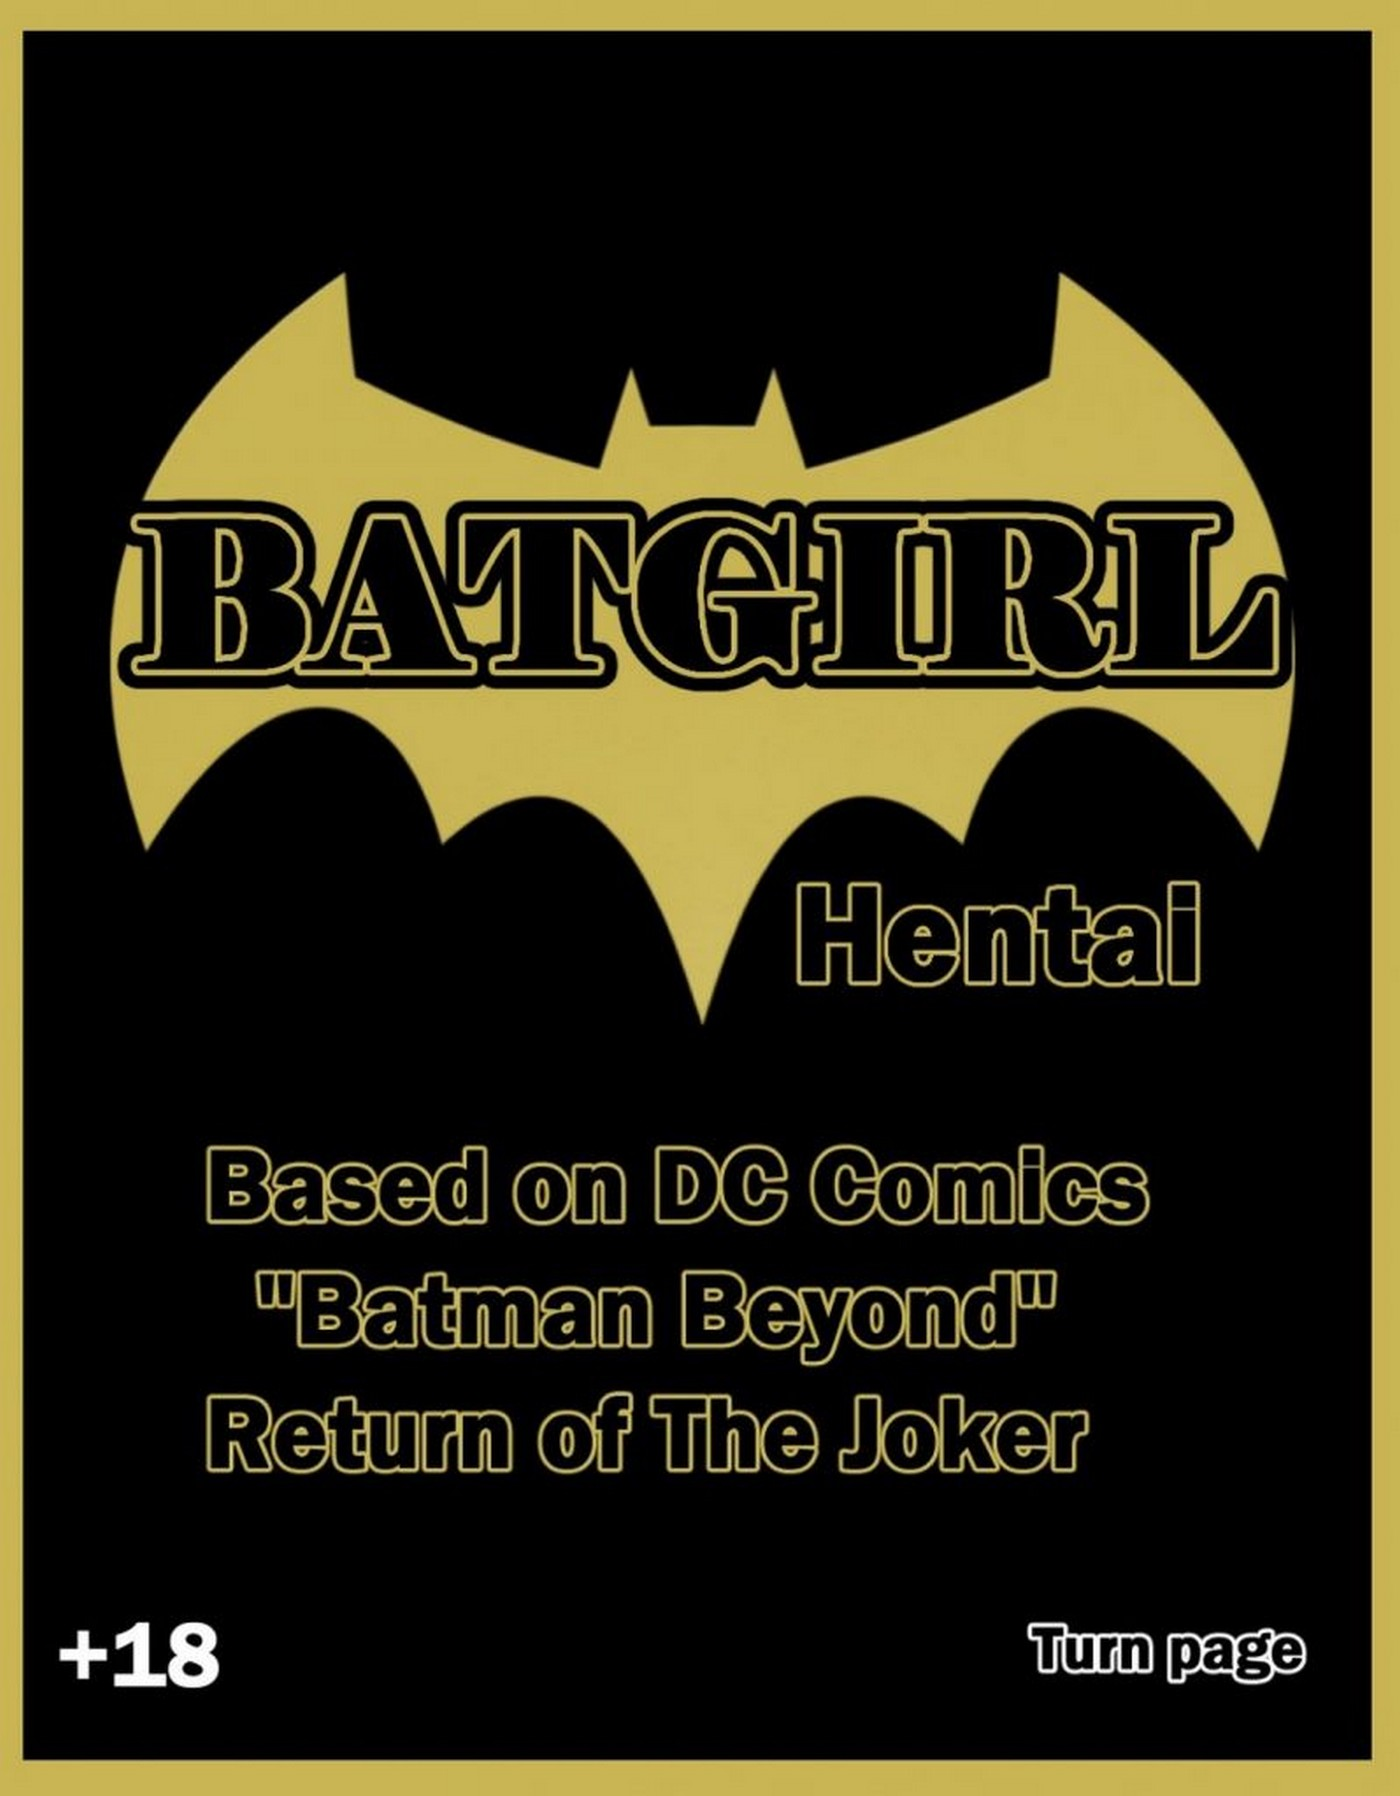 Batgirl Hentai Darkfang100 05